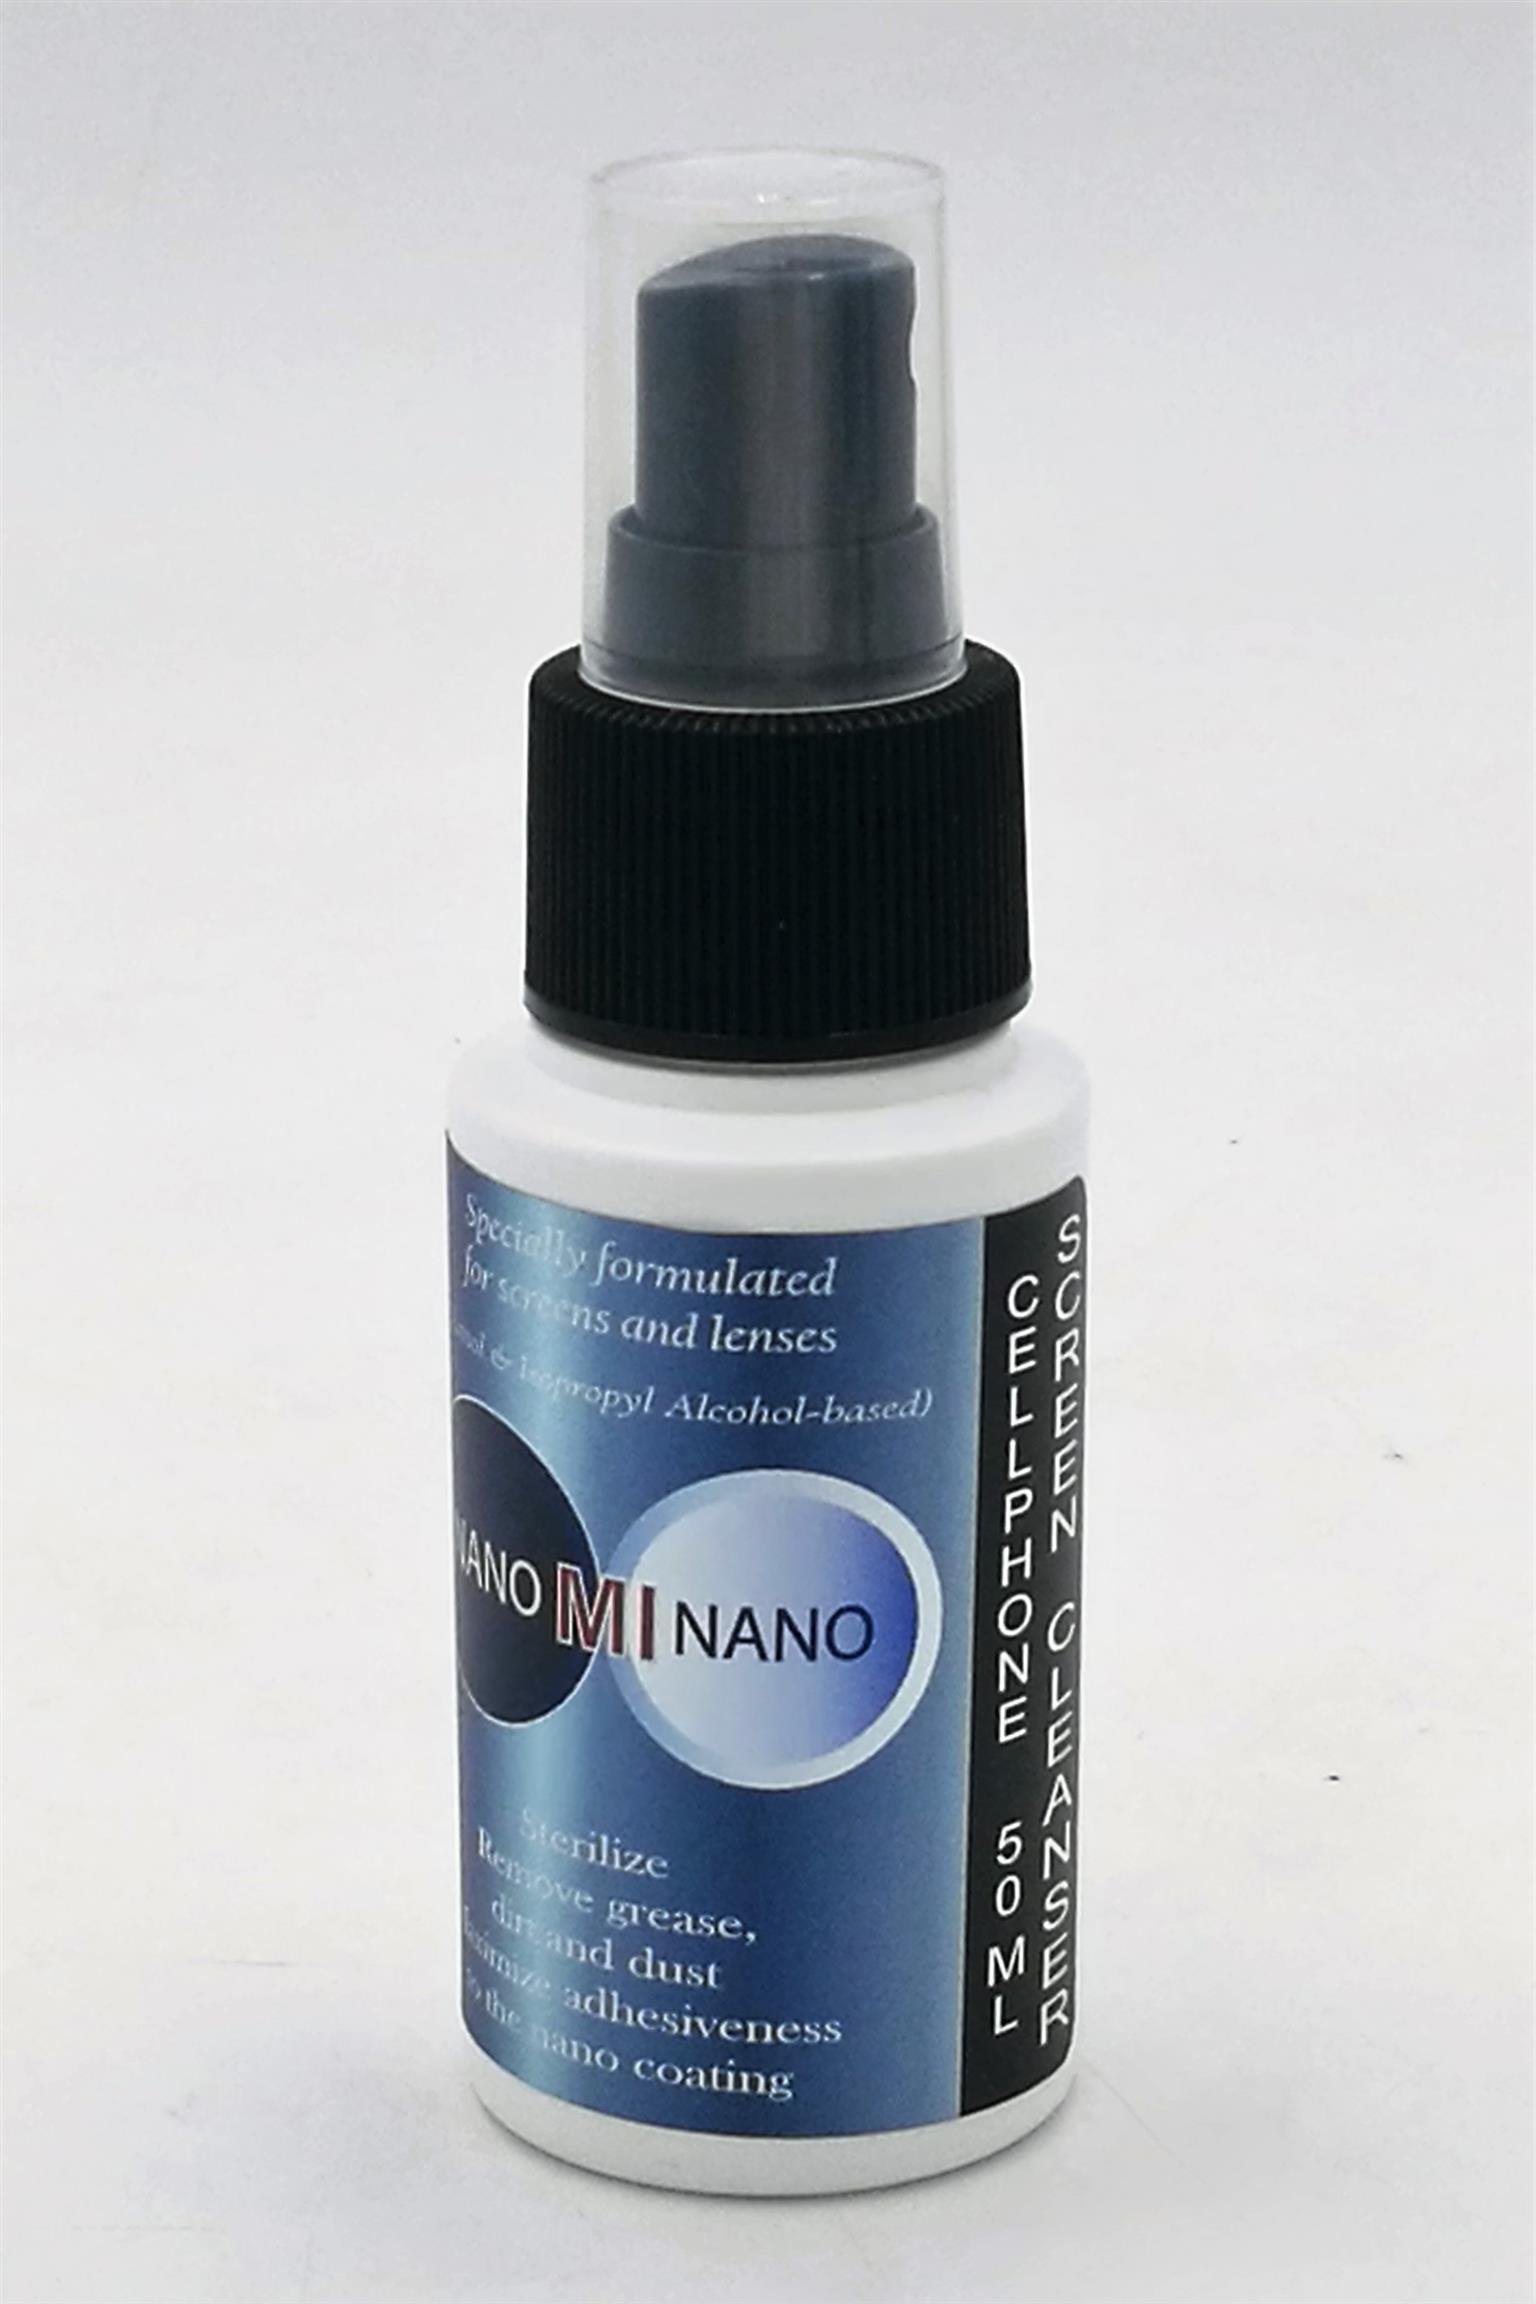 Nano Black Mini - Nano Liquid Coating Mini Kit for cell phone screen